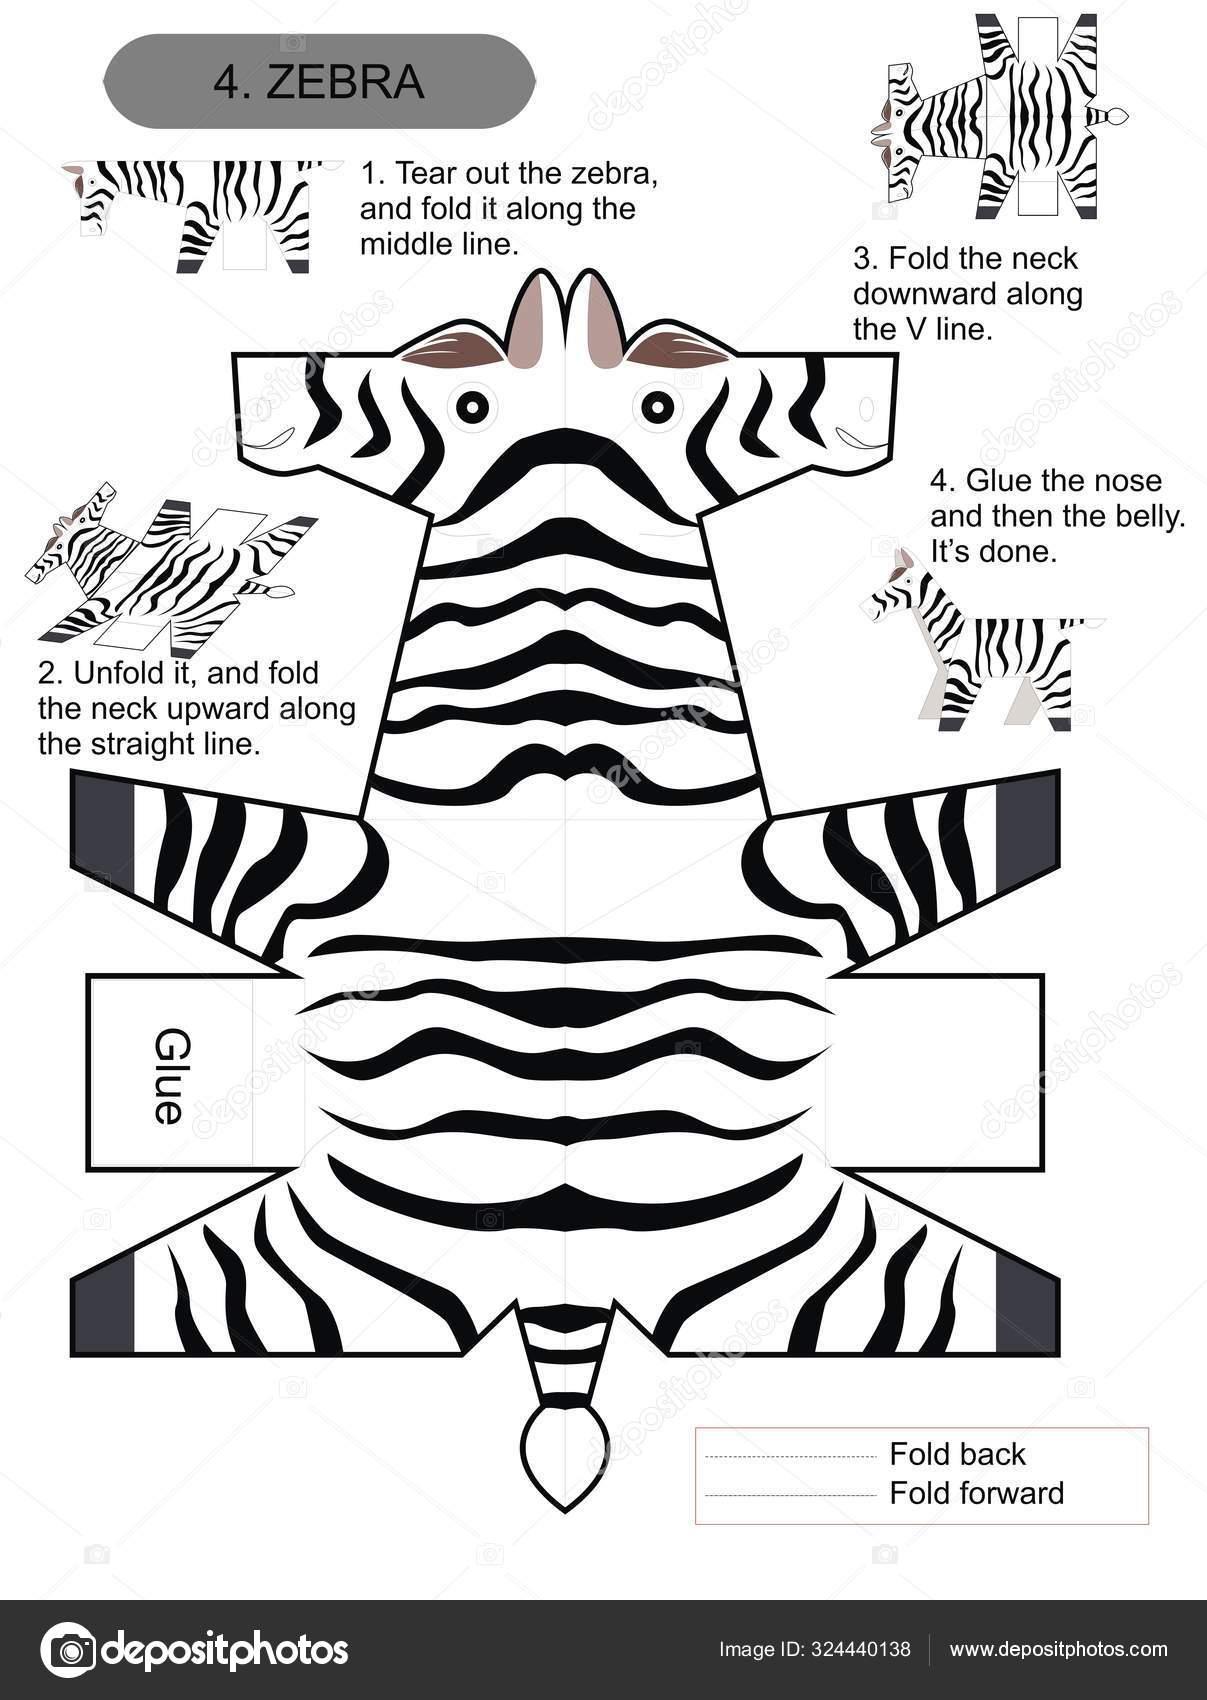 Origami - Wikipedia | 1700x1207